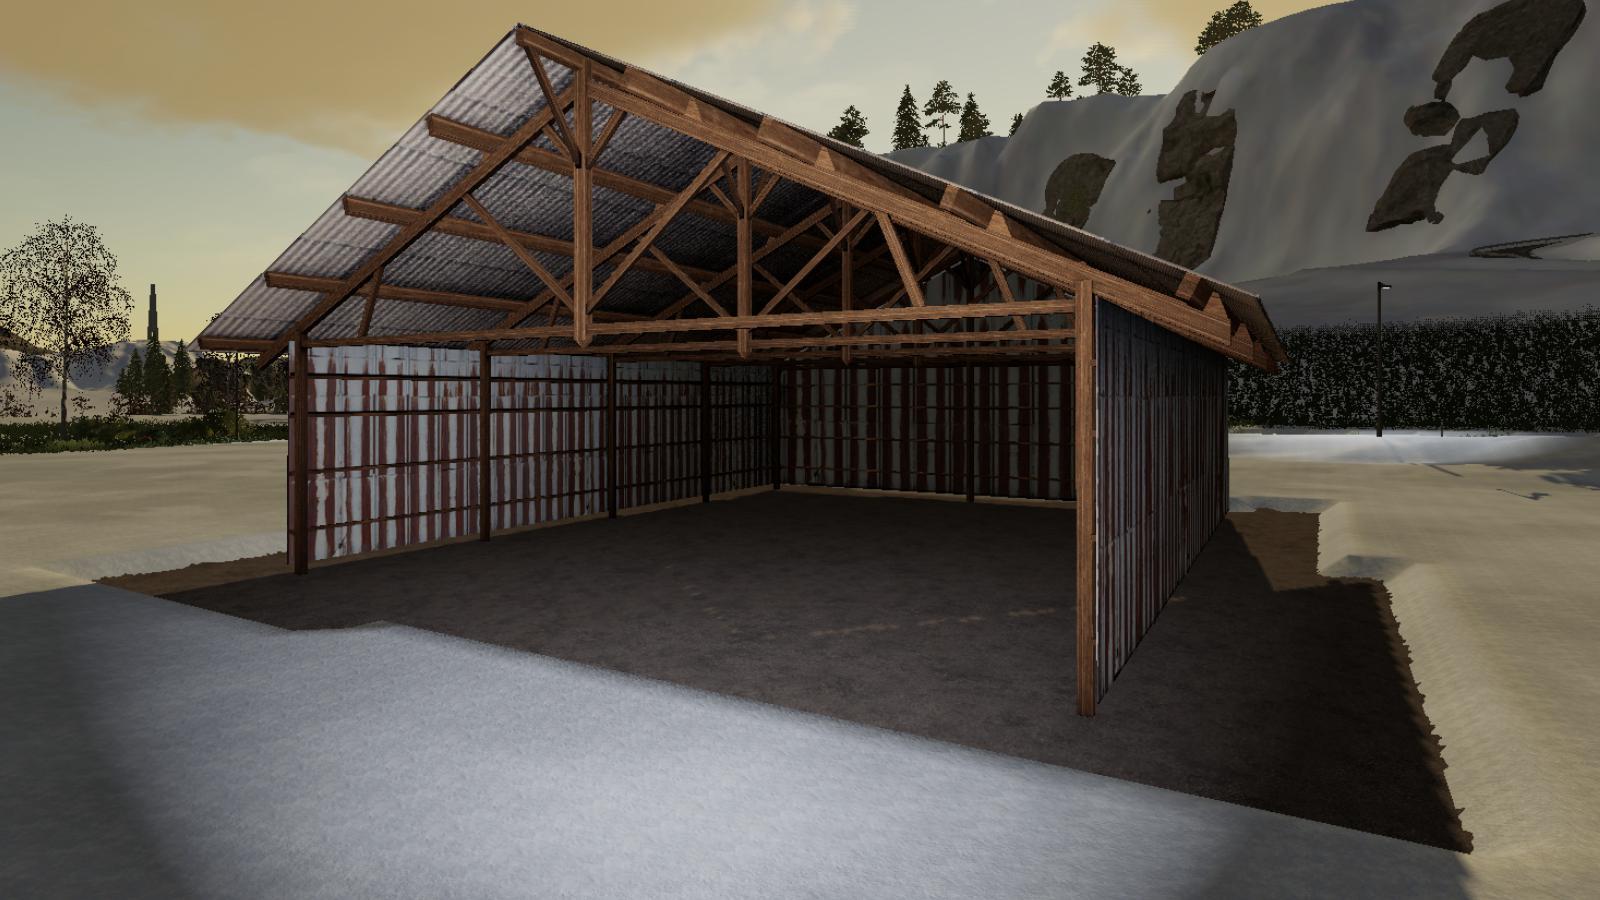 FS19 - Placeable Hangar Bois Metal V1.0